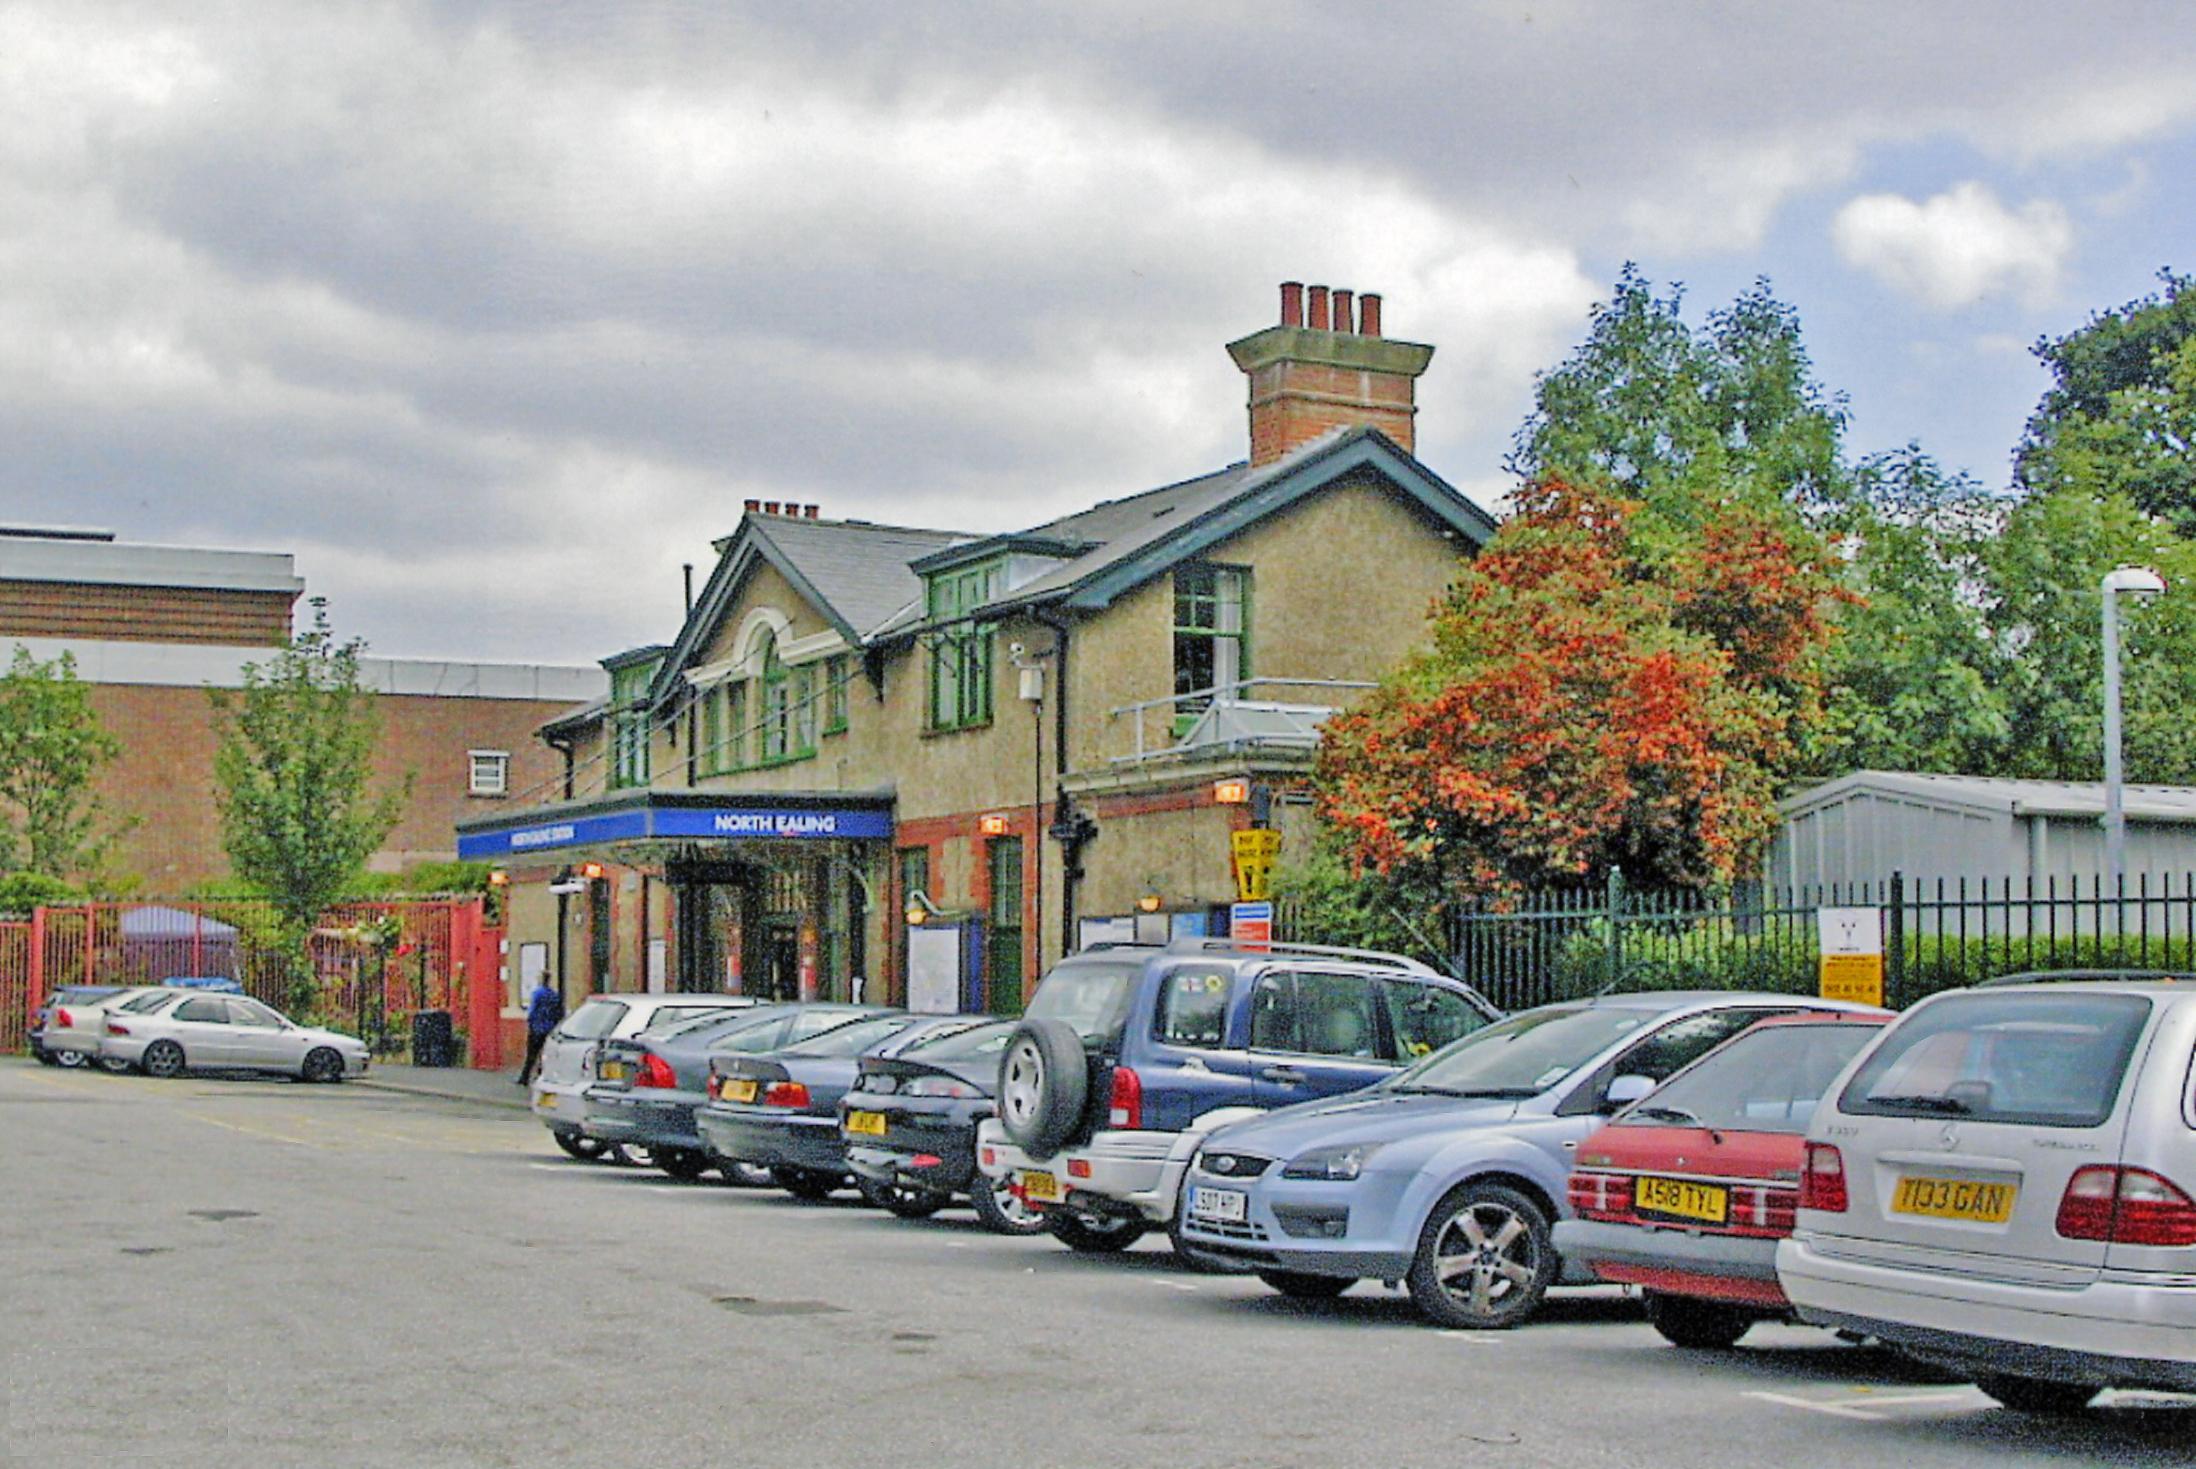 North Ealing Station Car Park